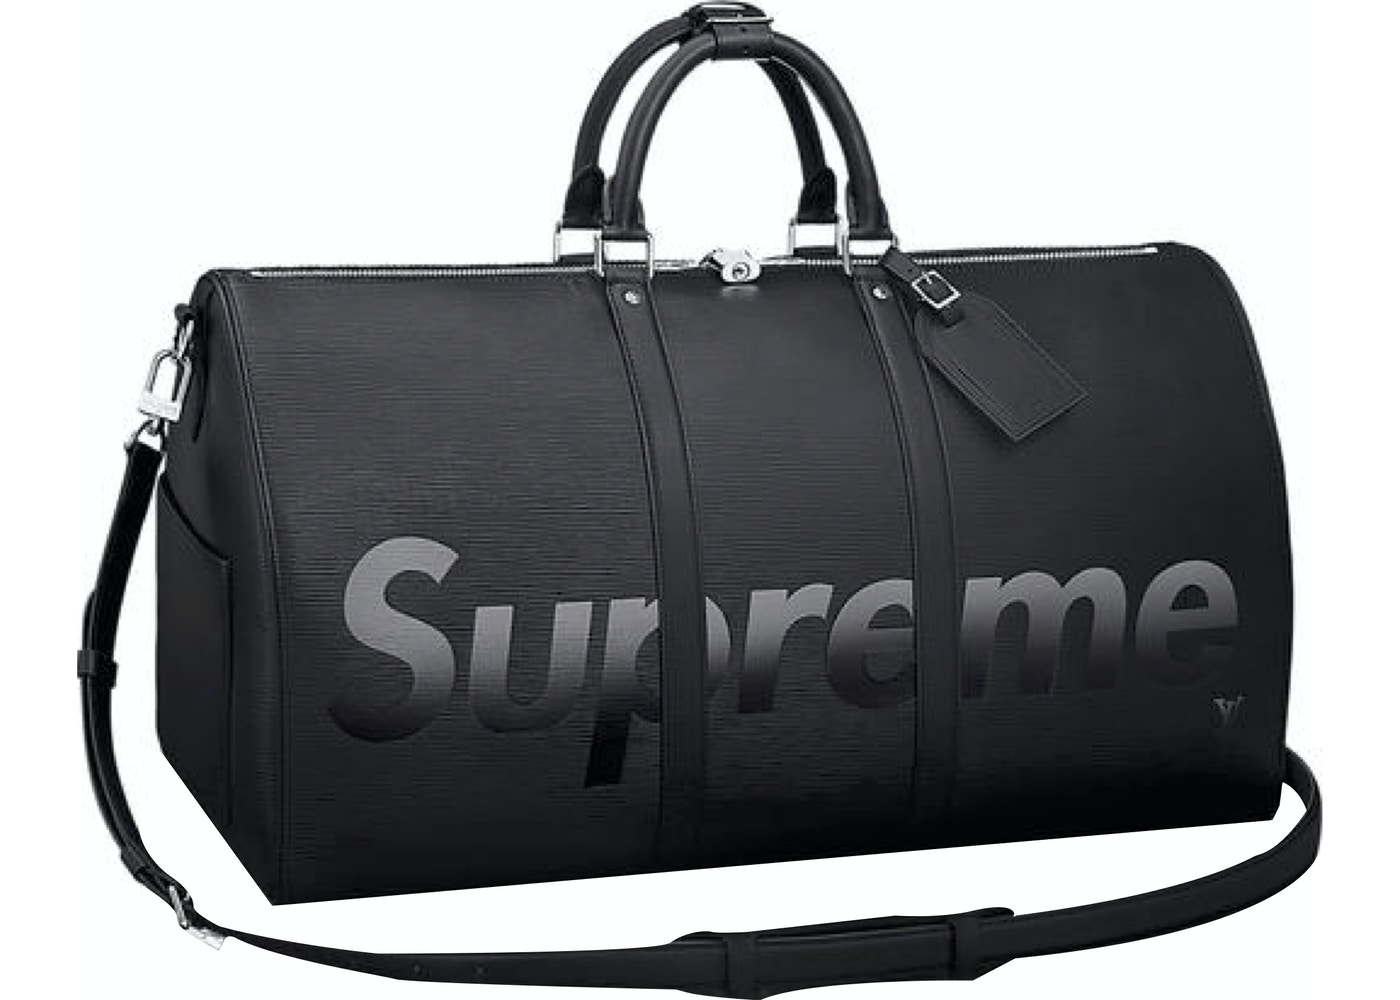 b307894468f Buy   Sell Louis Vuitton Supreme Handbags - Average Sale Price